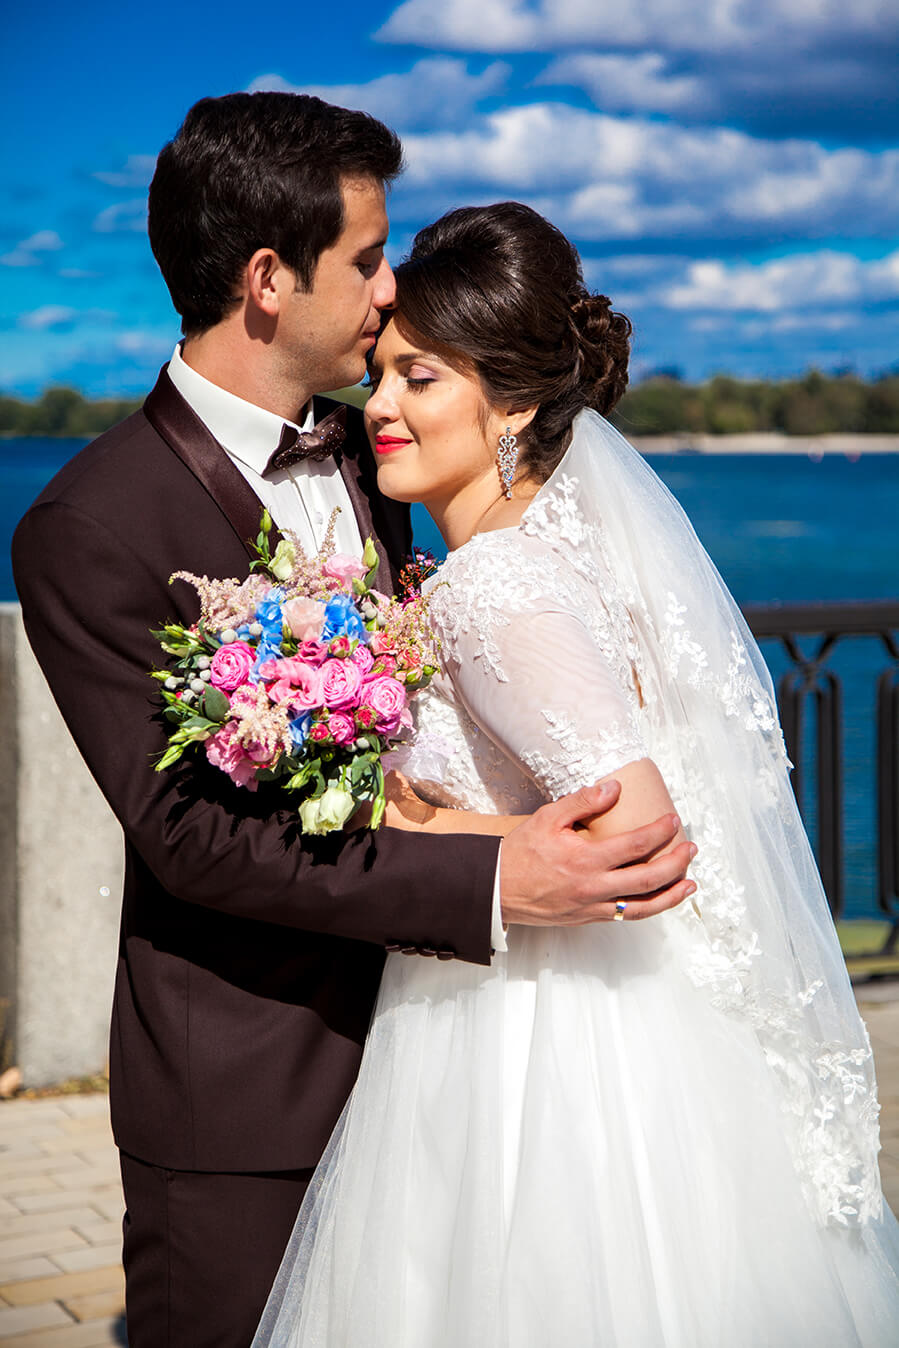 1-svadebnoe-foto-kiev-svadebnaja-progulka-mesta-dlja-svadebnoj-fotosessii-10